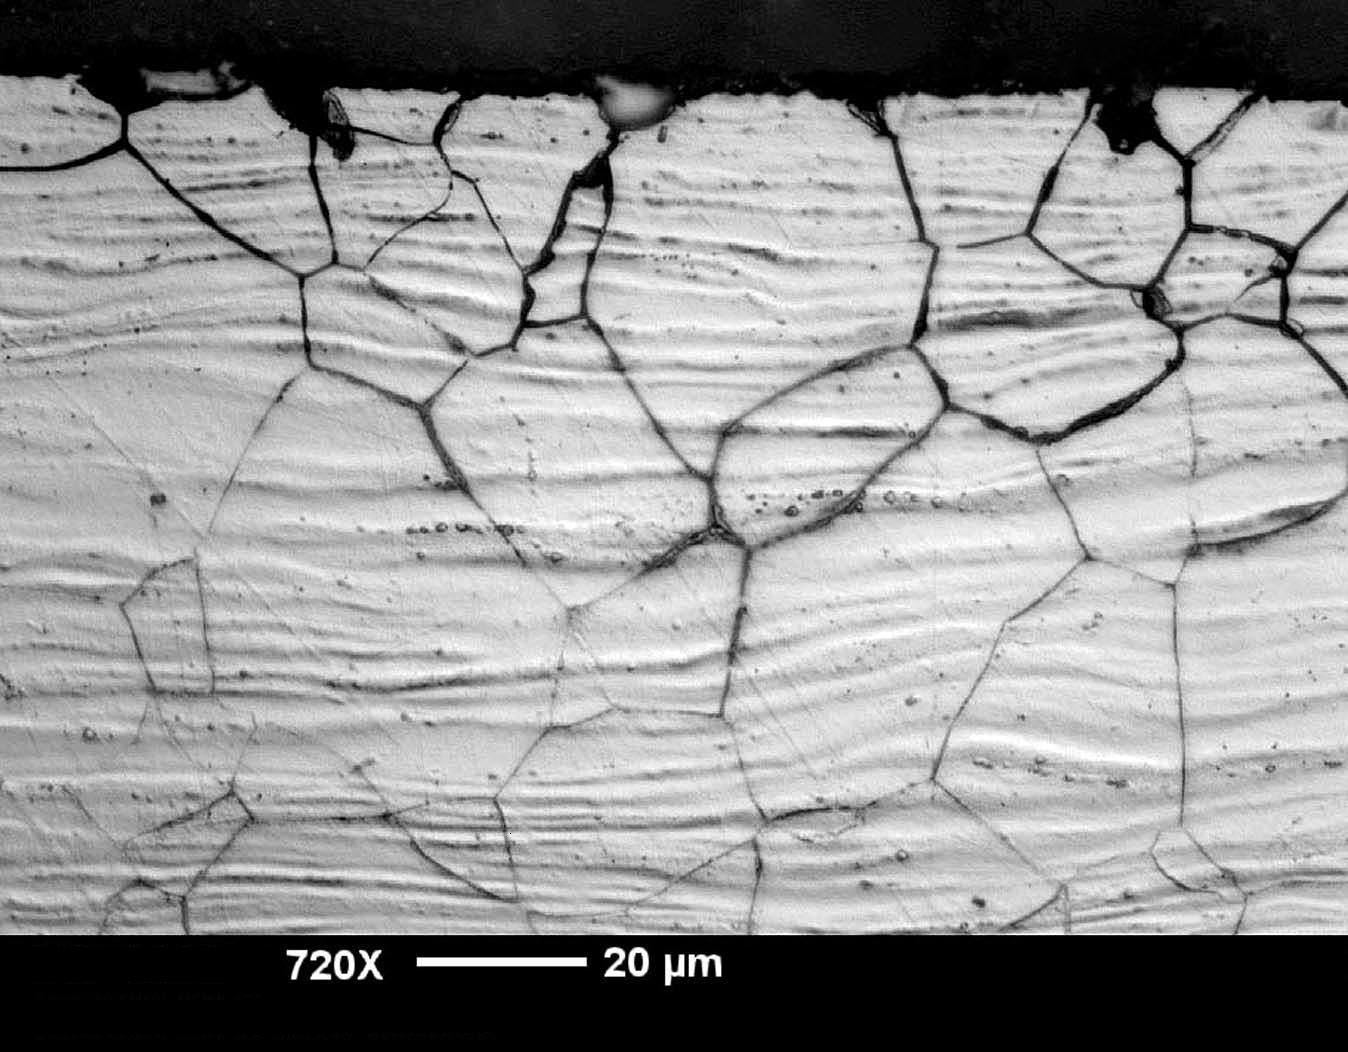 corrosion intergranular precipitacion carburos cromo